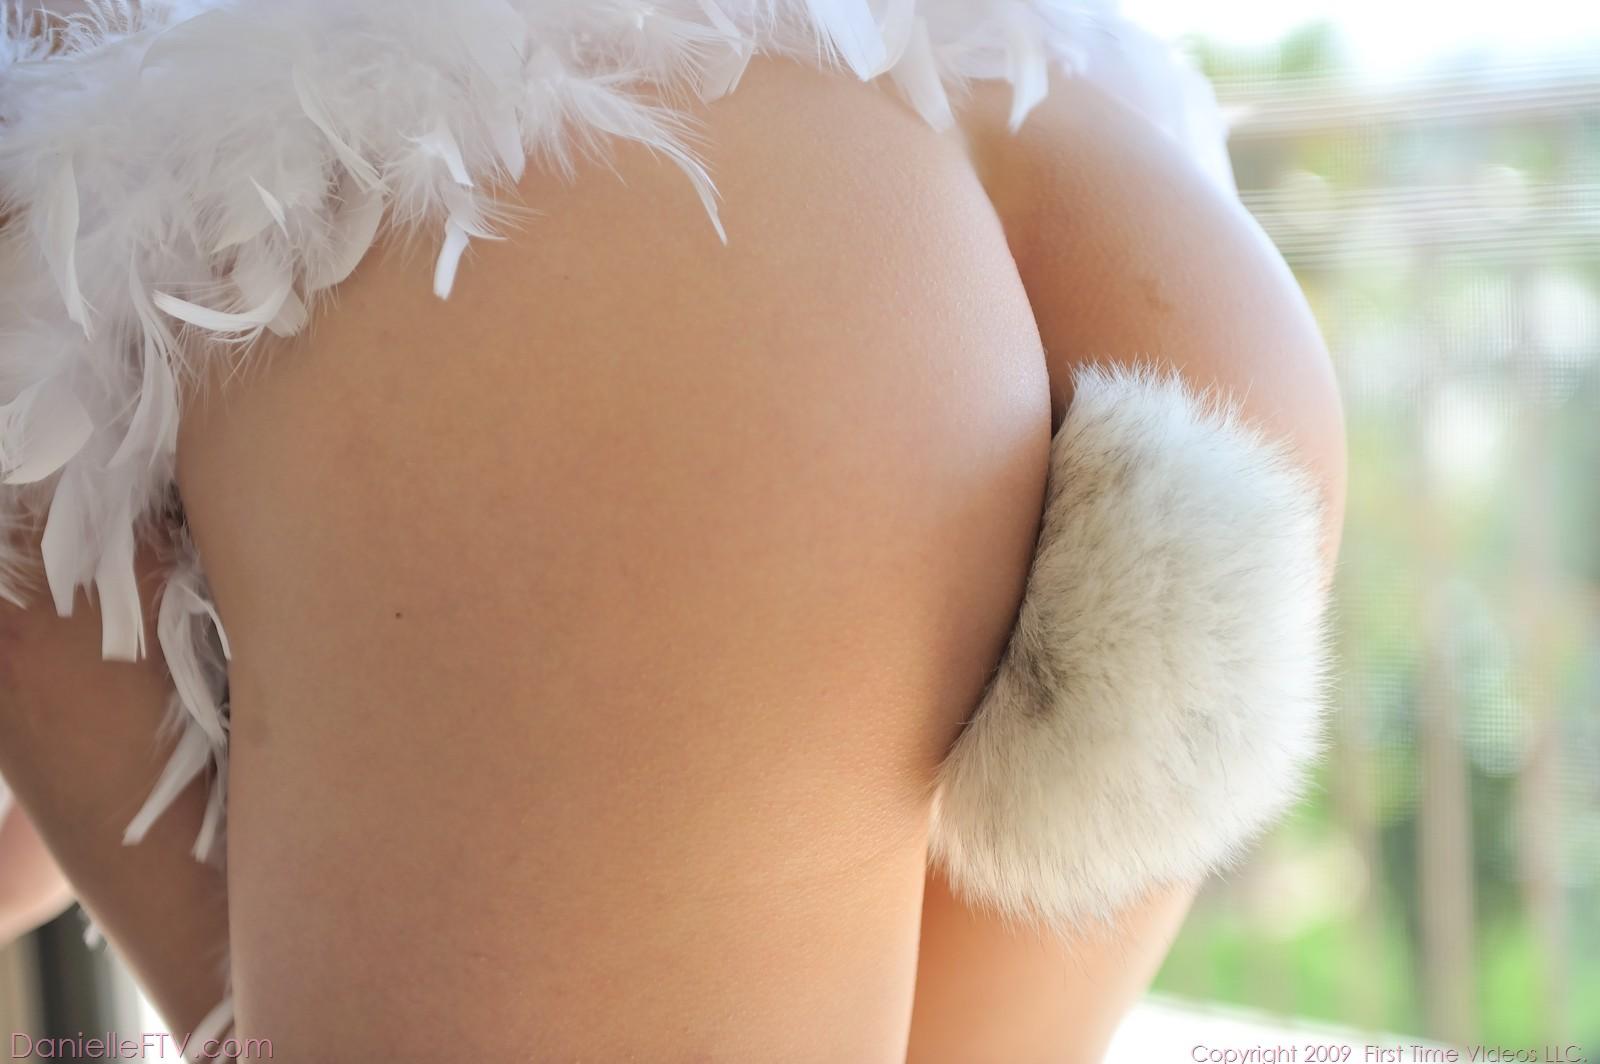 Bunny tail anal